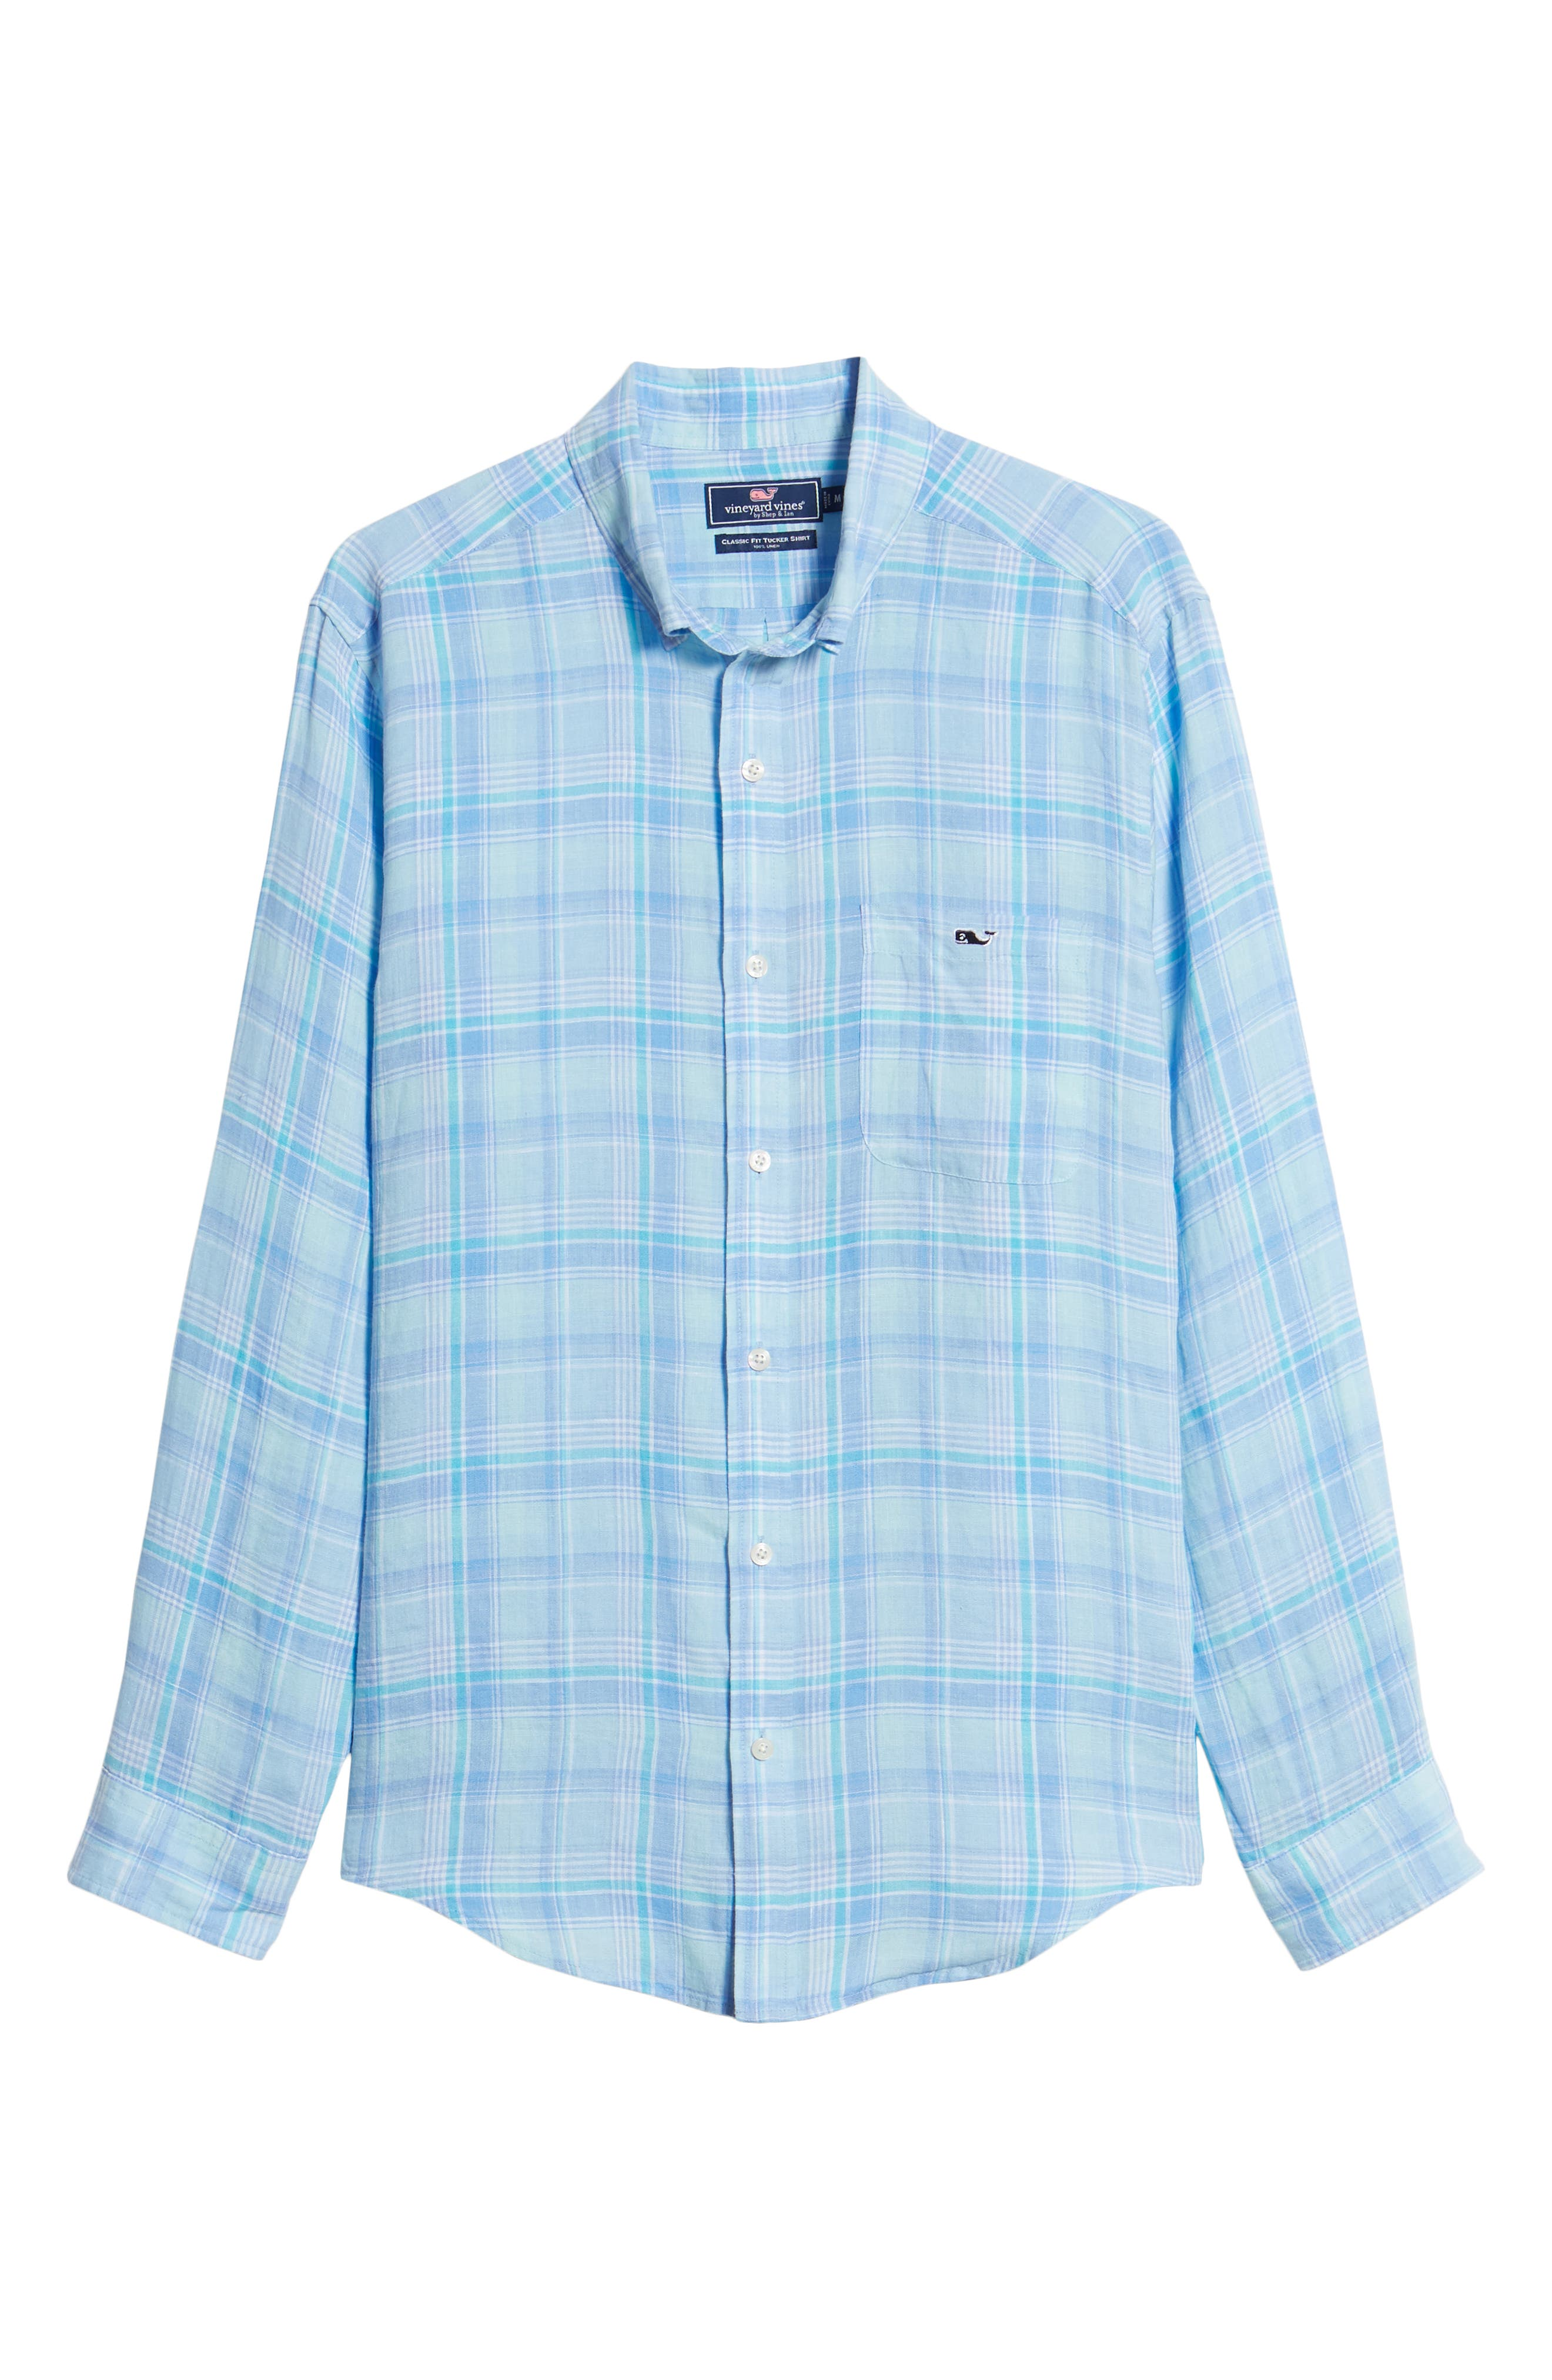 Moore's Island Classic Fit Plaid Sport Shirt,                             Alternate thumbnail 6, color,                             400